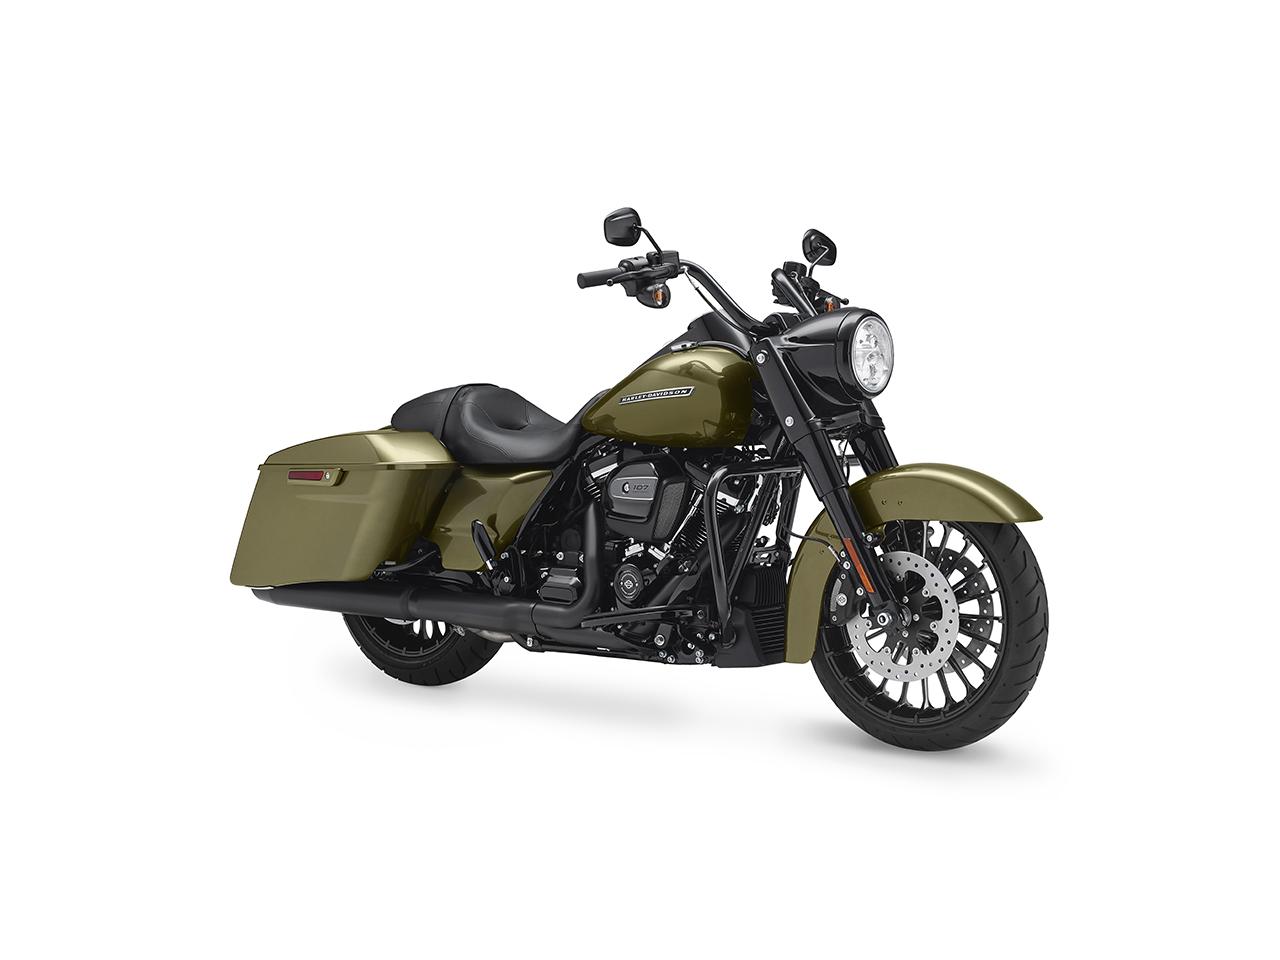 2018 Harley-Davidson Road King Special Image